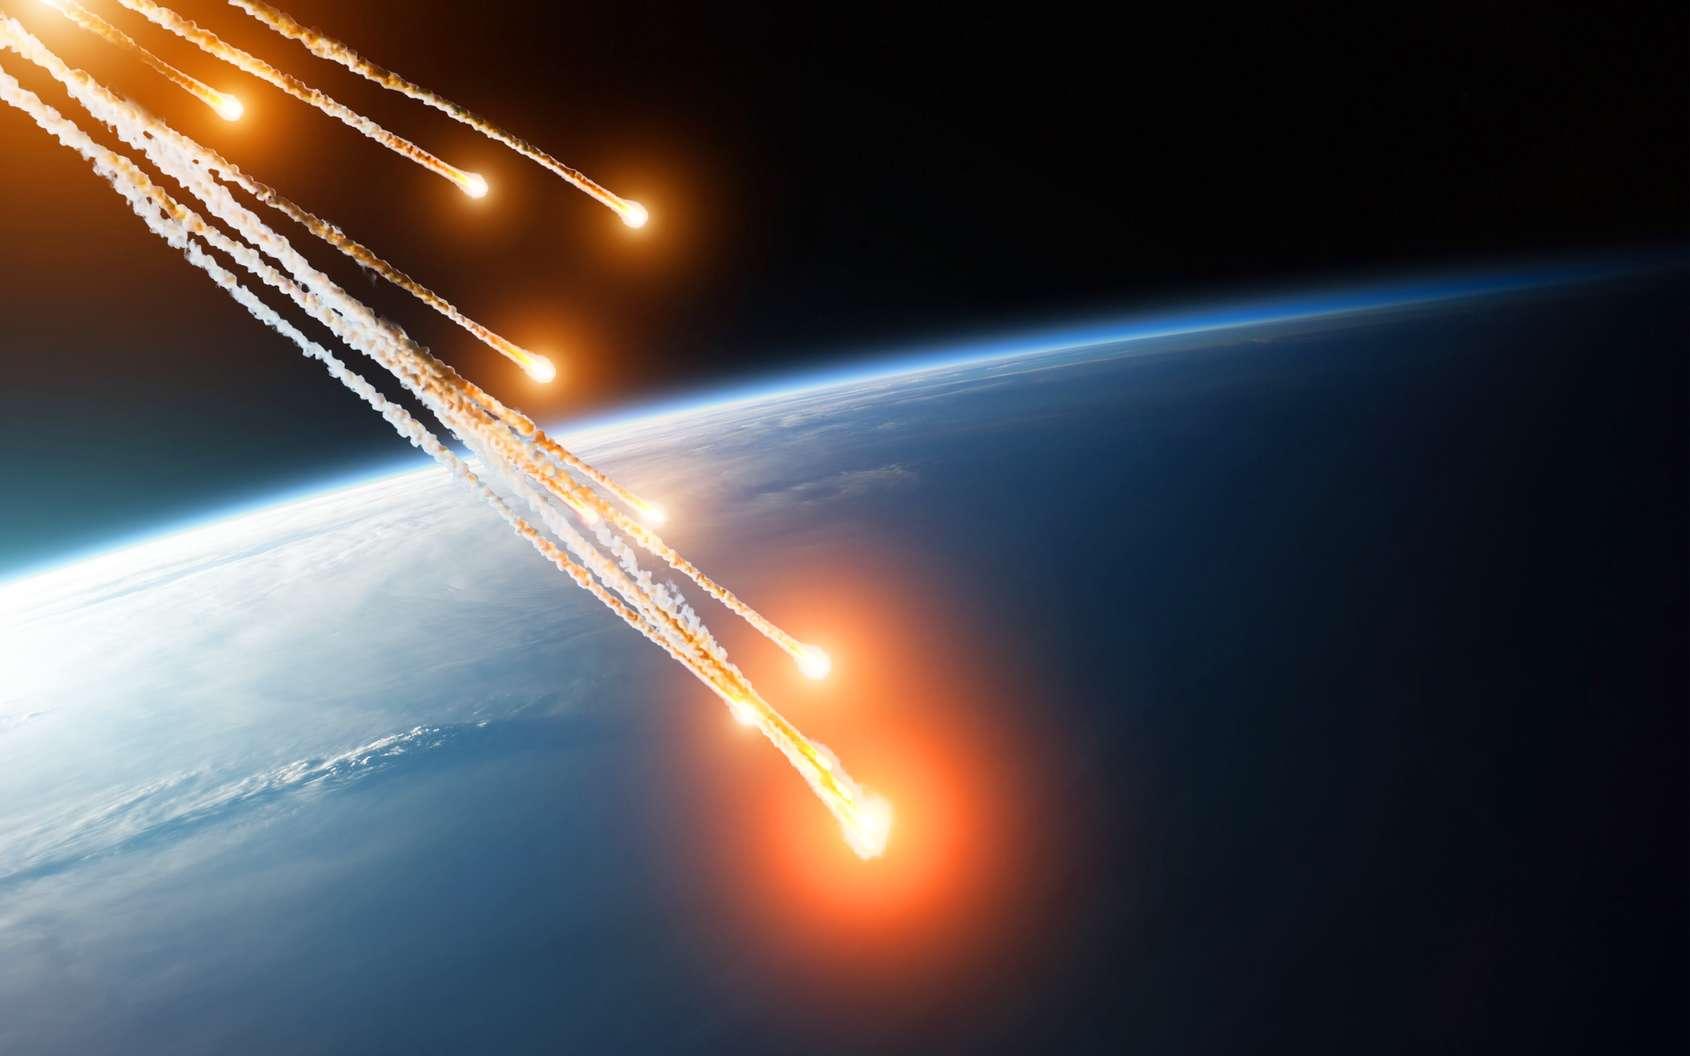 Météorites tombant sur Terre. © aapsky, fotolia